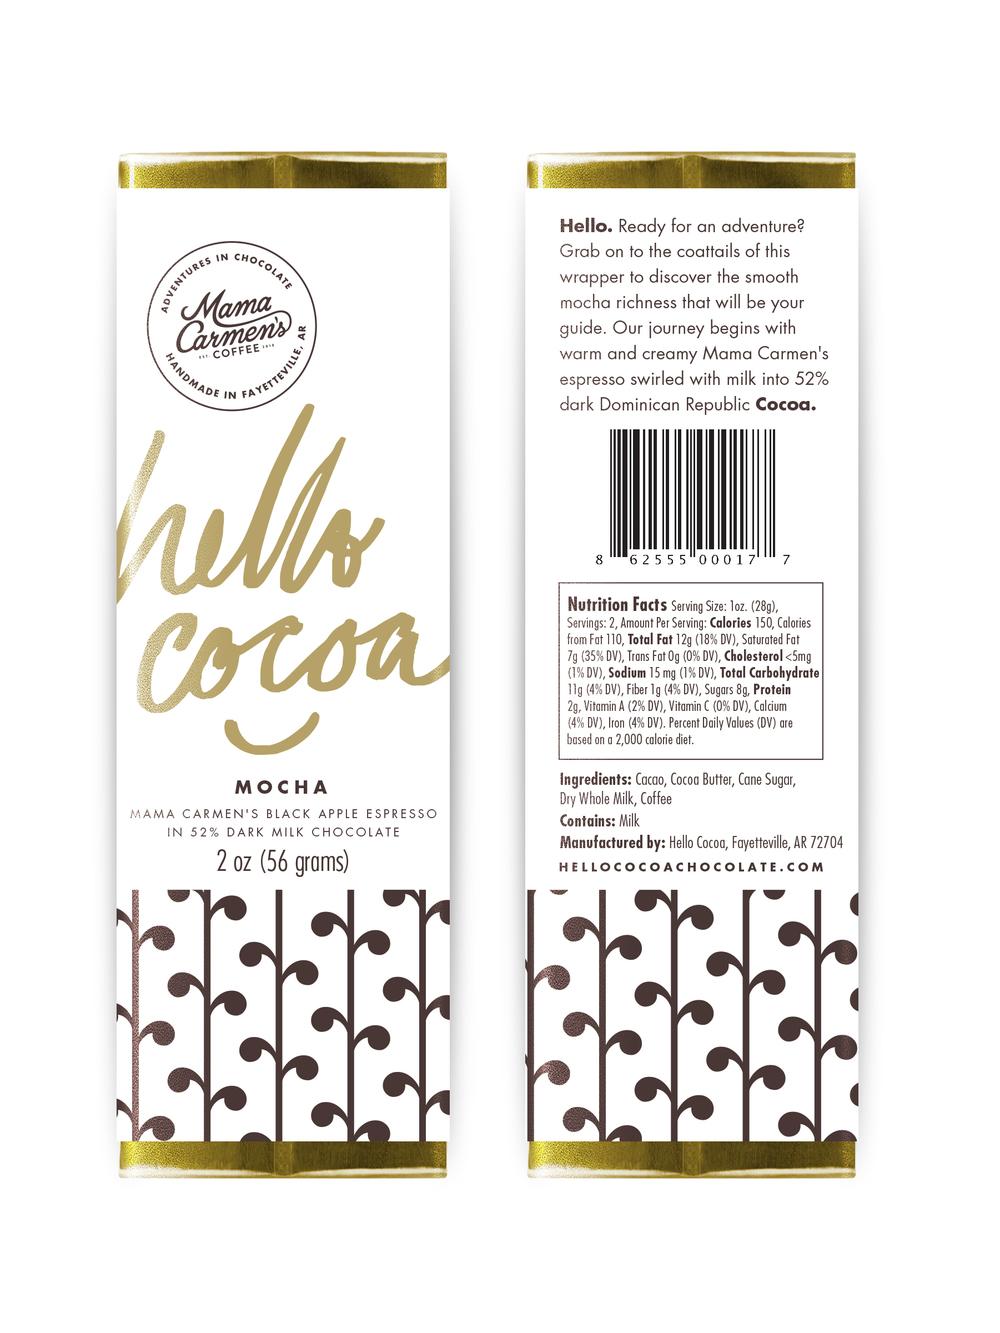 Mocha - dark chocolate with milk and espresso